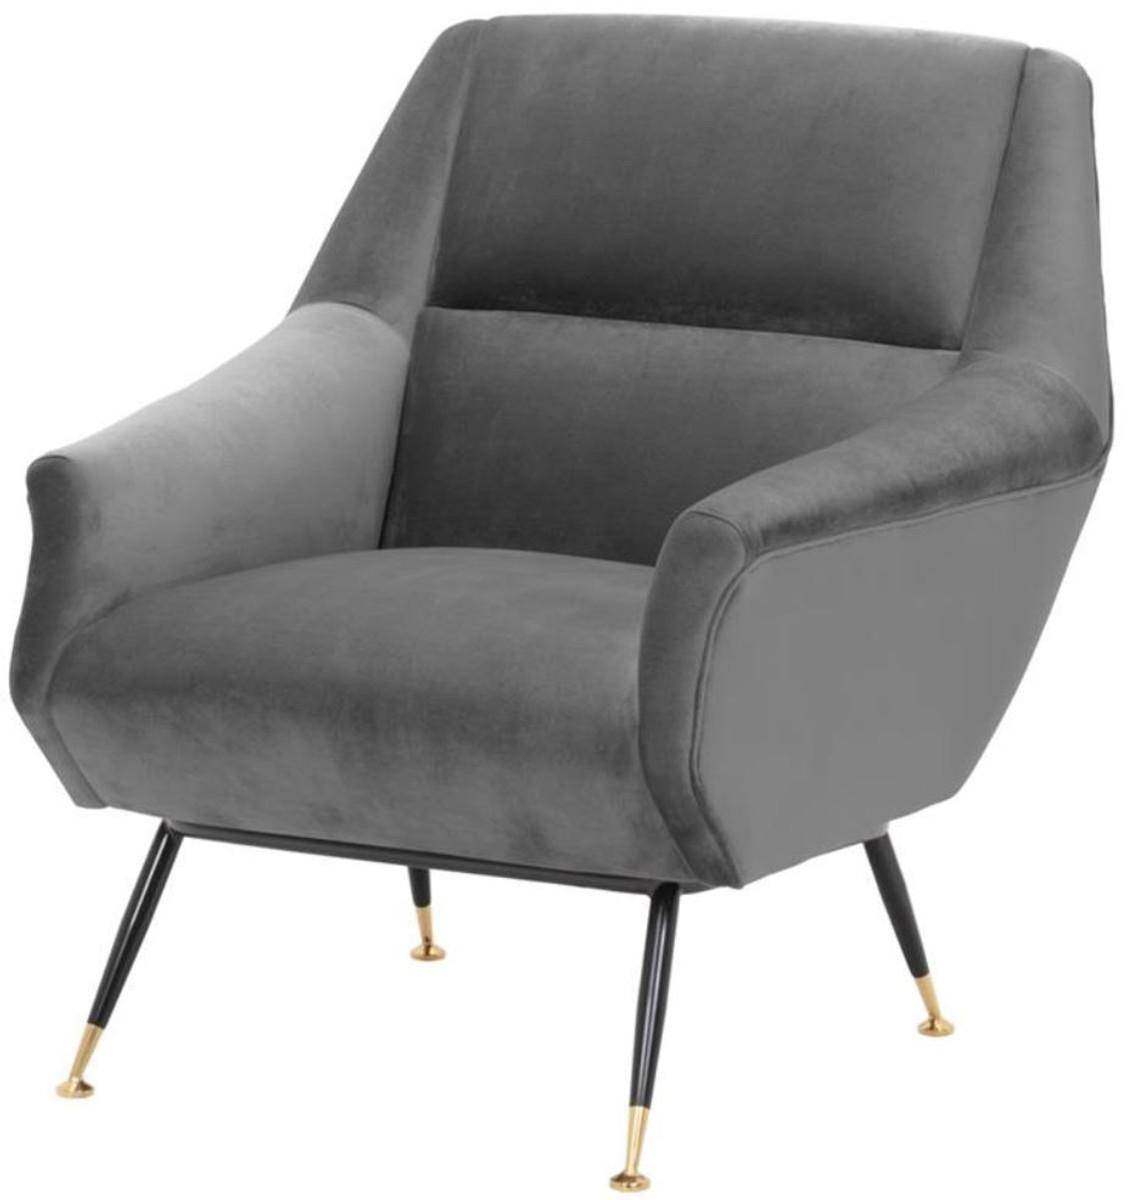 Casa Padrino Luxus Salon Sessel Grau / Schwarz / Messing 75 x 75 x H. 78 cm - Hotel Möbel 1